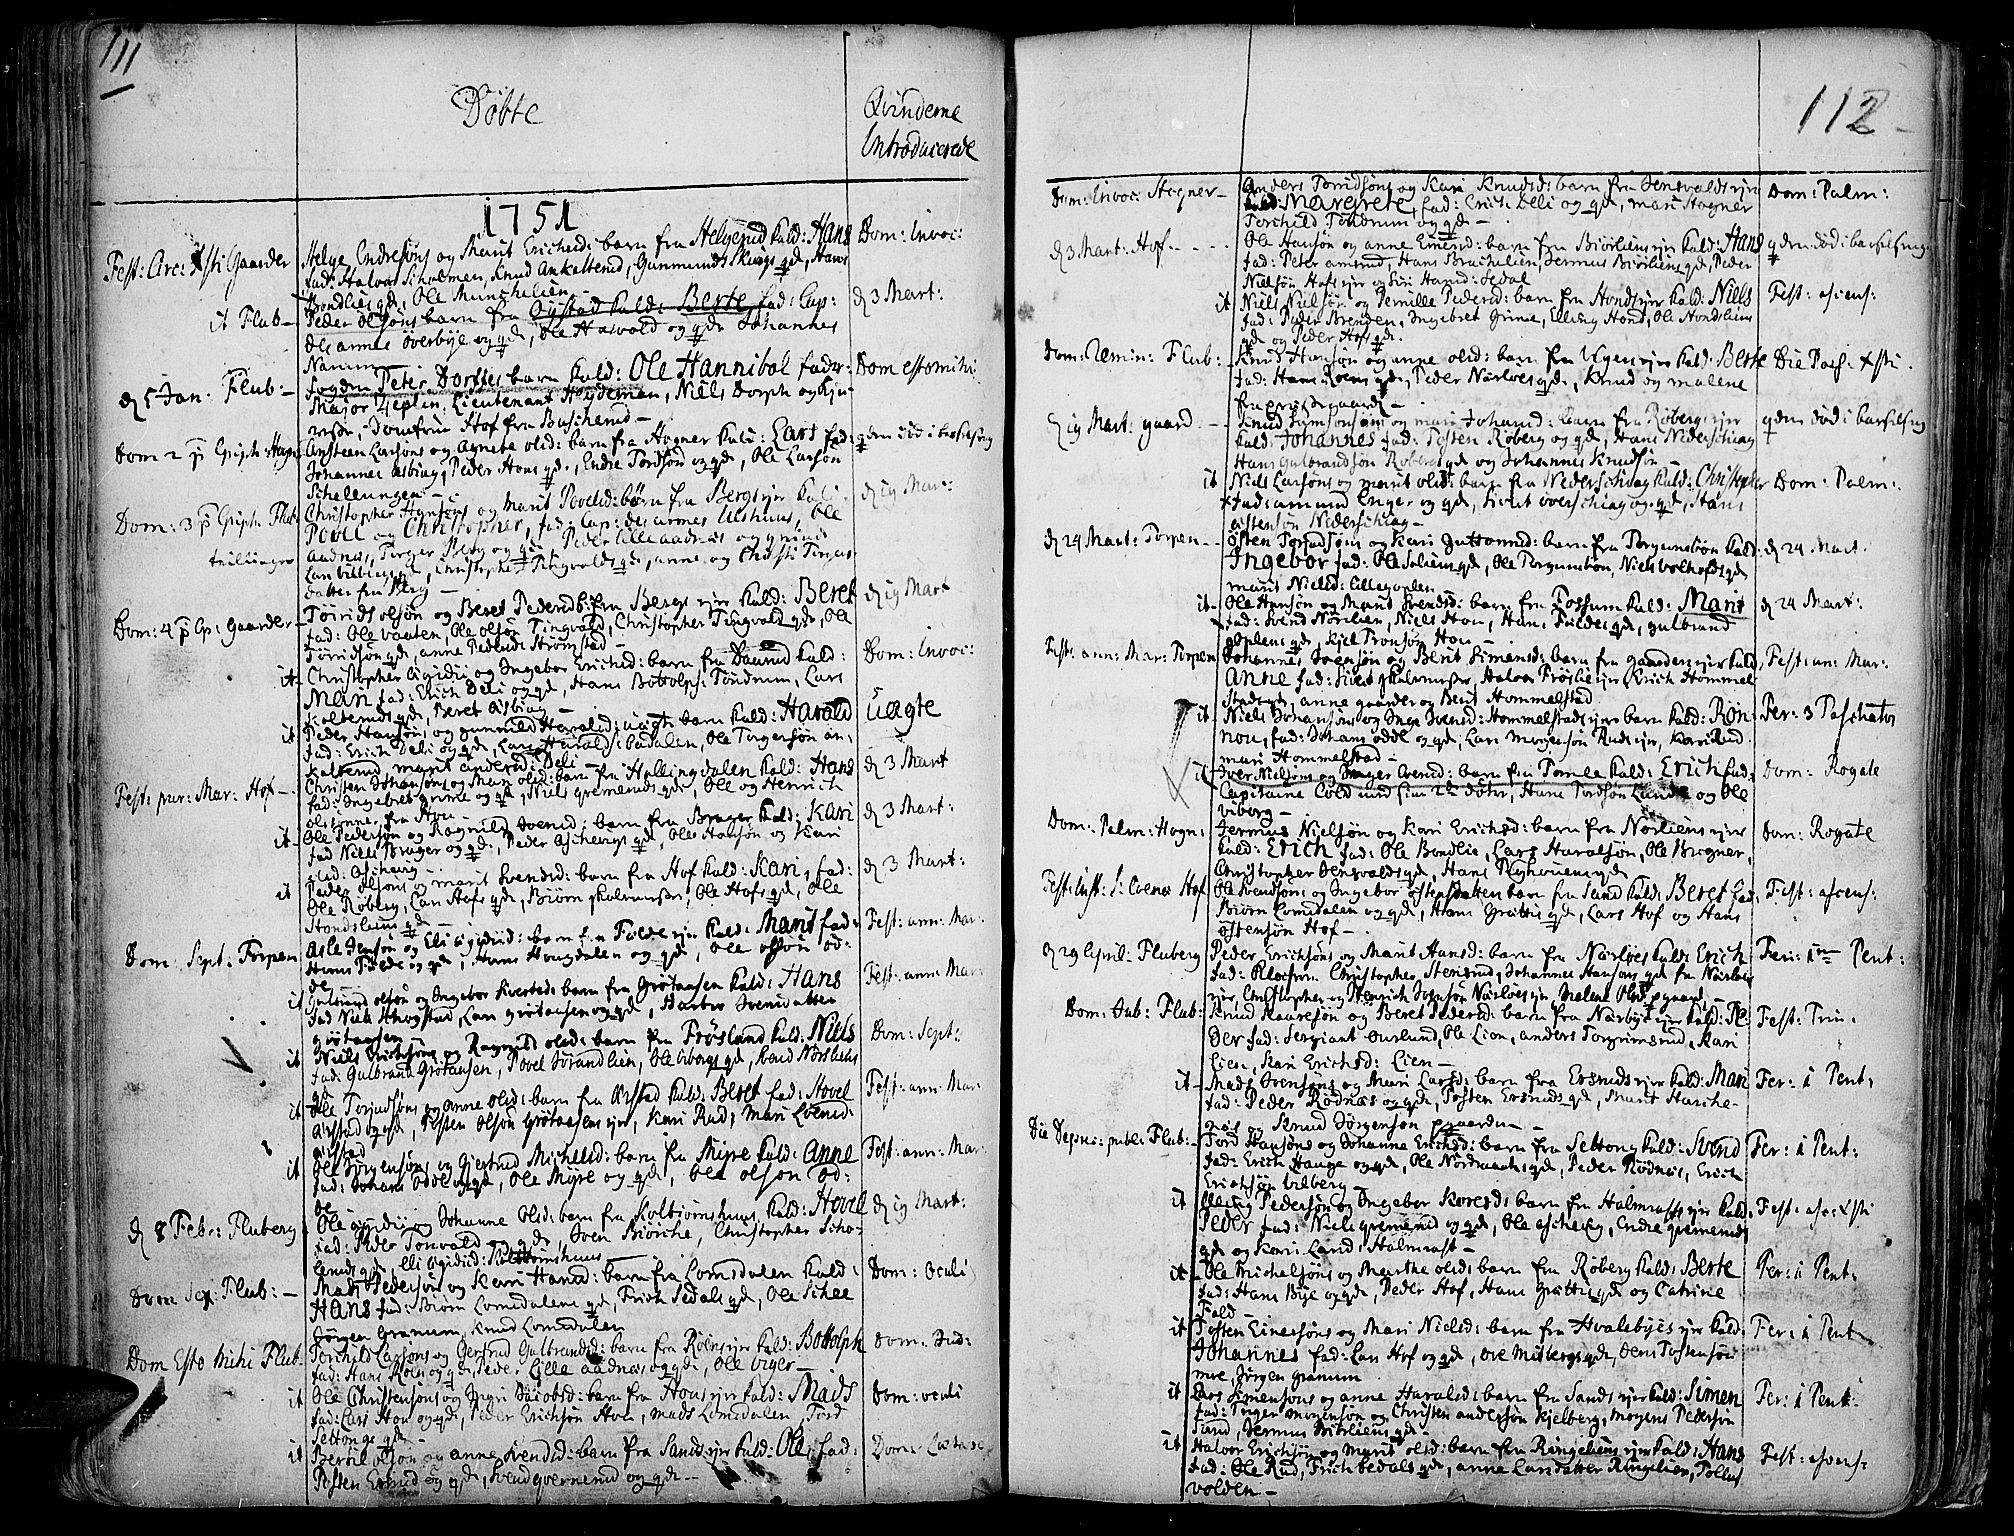 SAH, Land prestekontor, Ministerialbok nr. 2, 1733-1764, s. 111-112